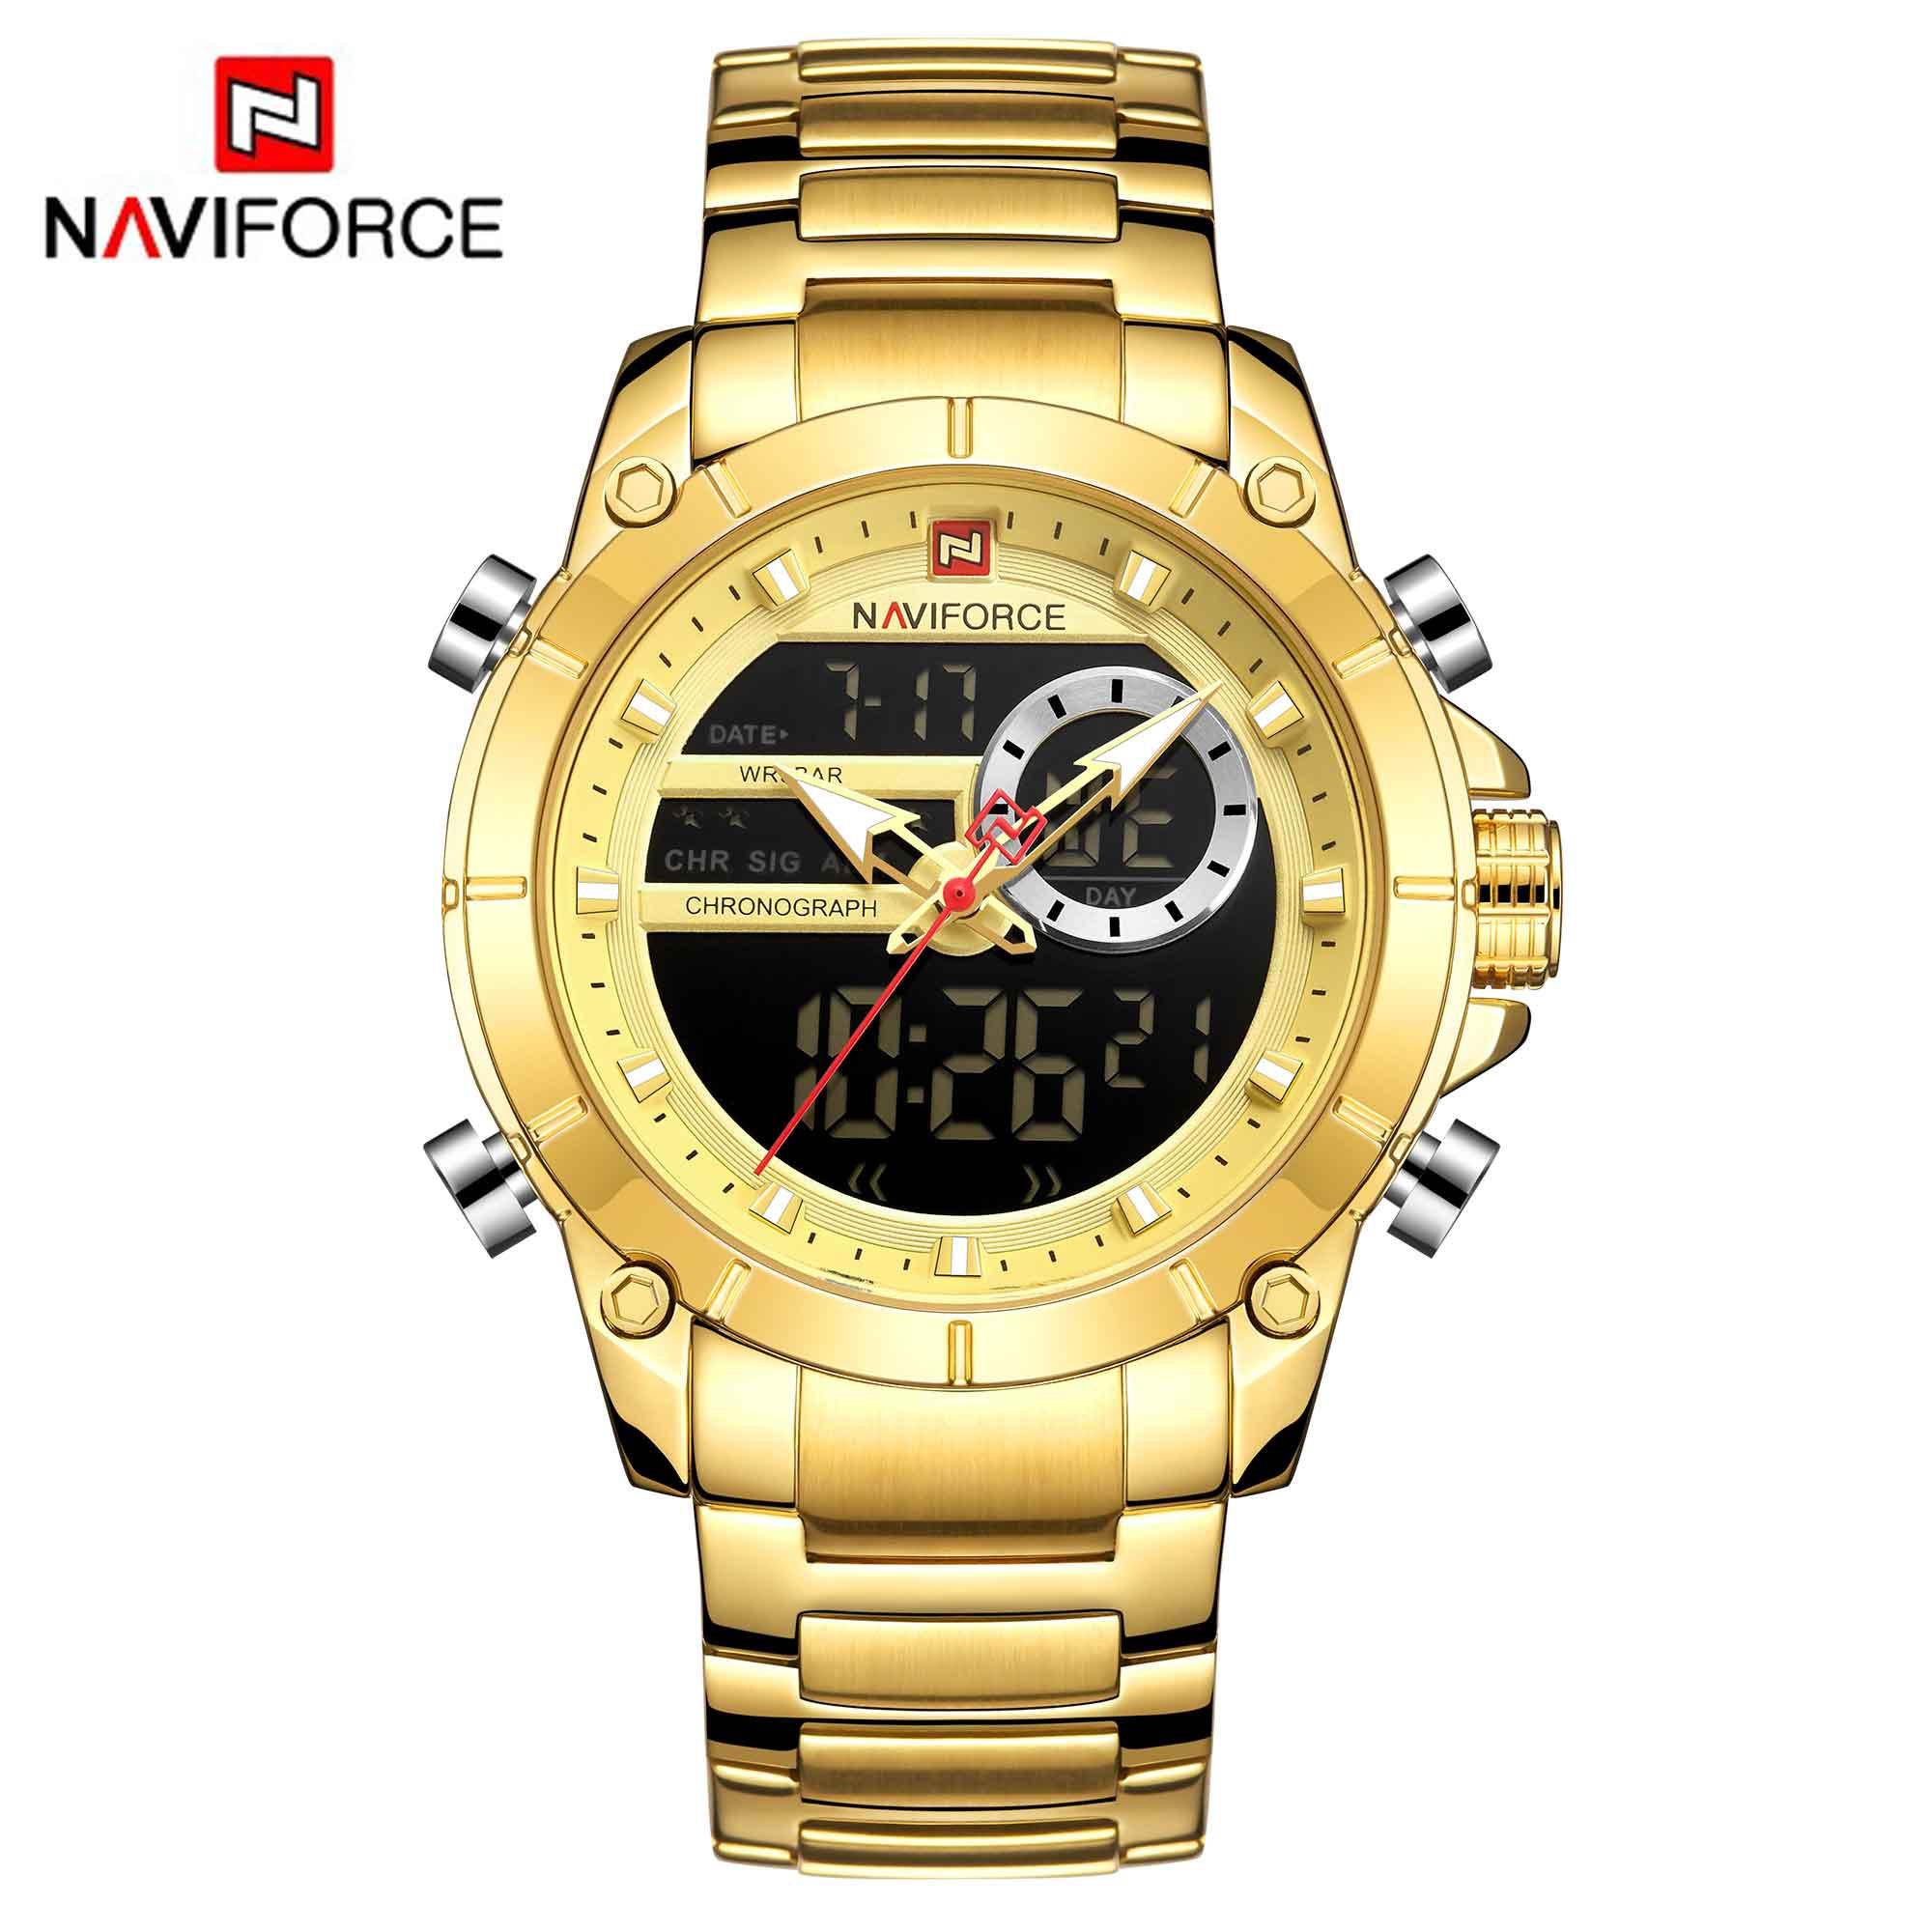 NAVIFORCE Hot Men Watches Fashion Casual Bussiness Quartz Watch Men Military Chronograph Stainless Steel Wristwatch Reloj Hombre 4